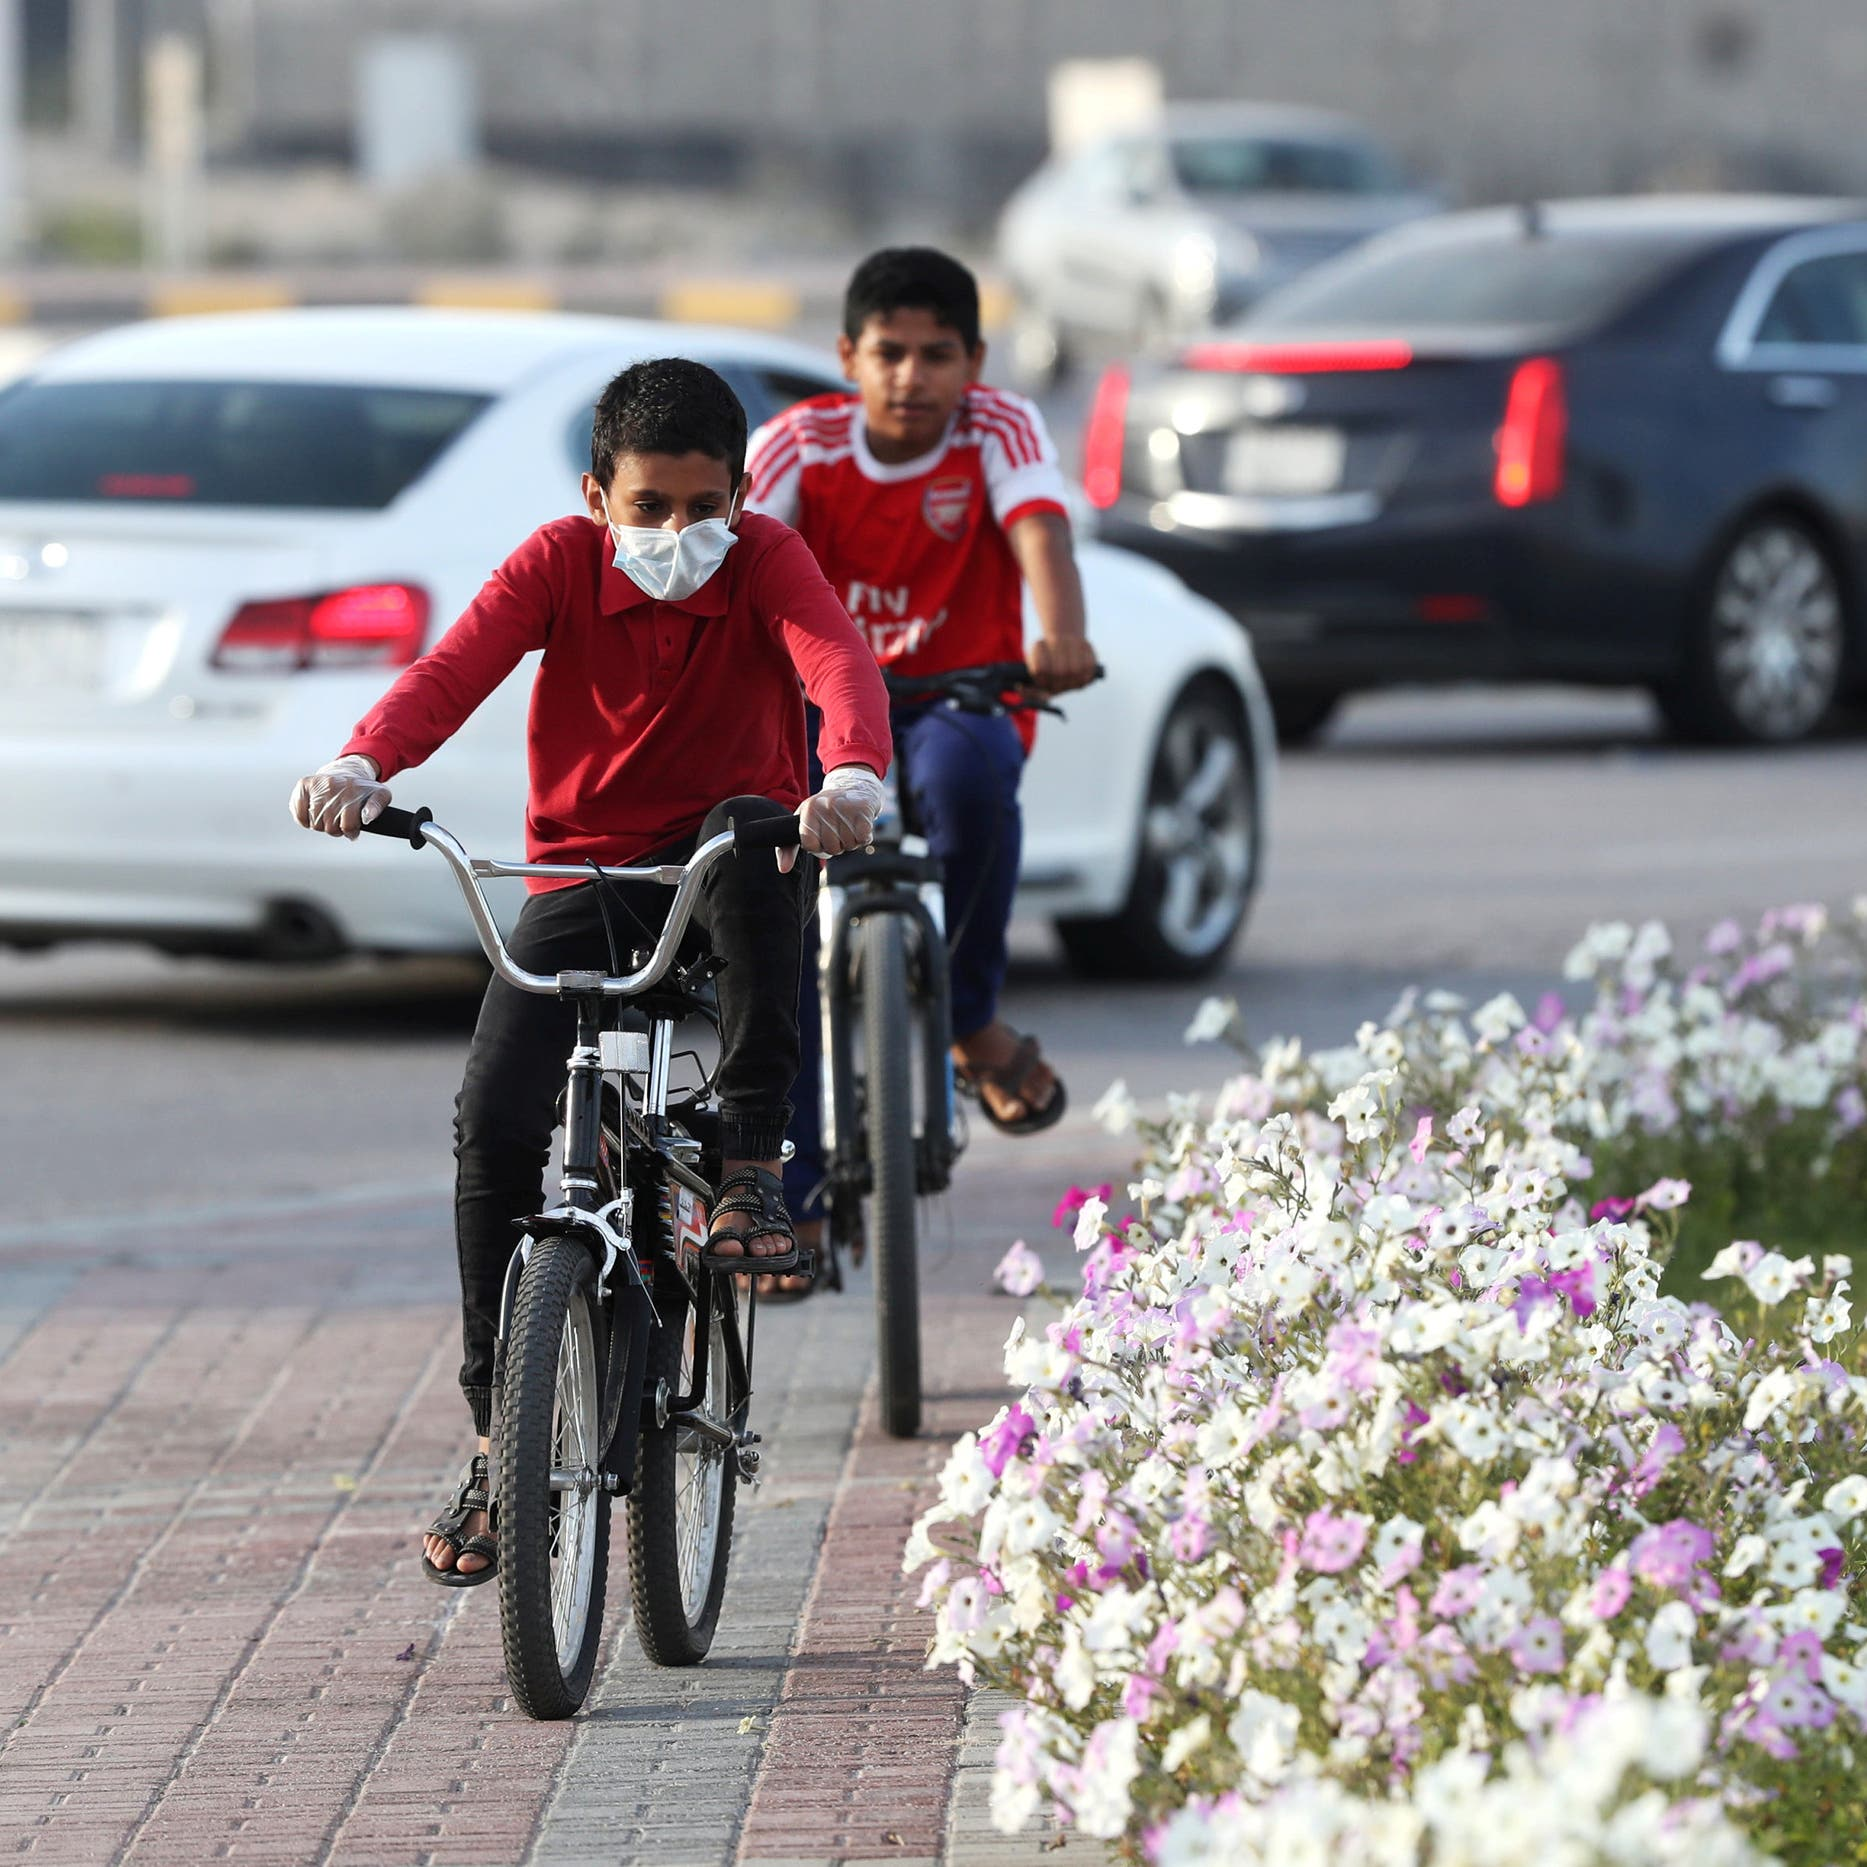 Saudi Arabia: A dynamic of change and modernization